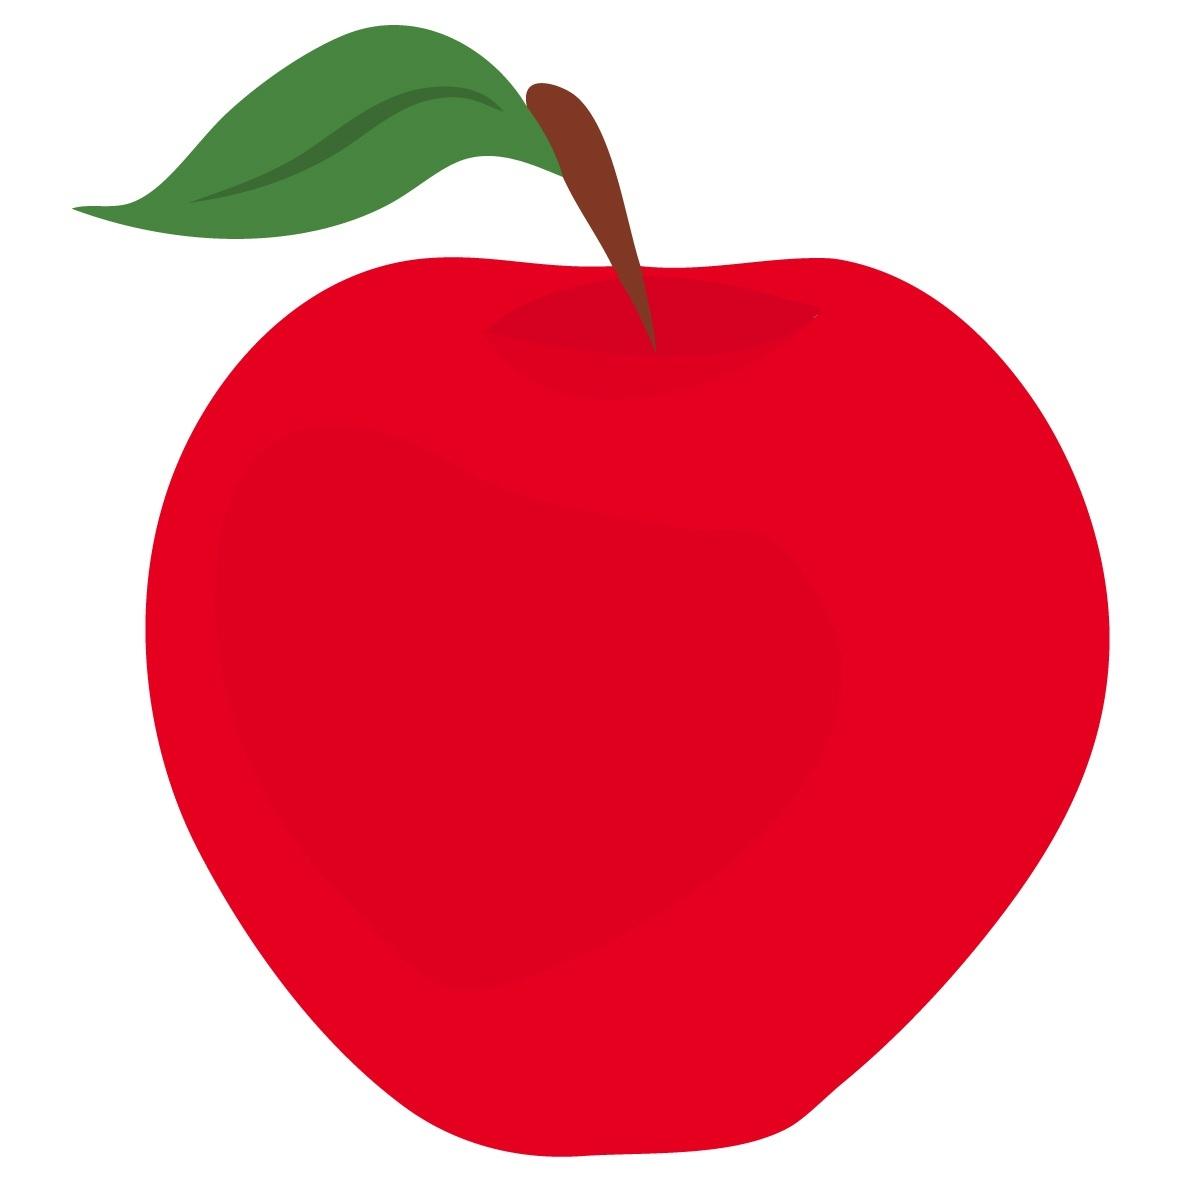 Amazing of teacher no. Apple clipart kid